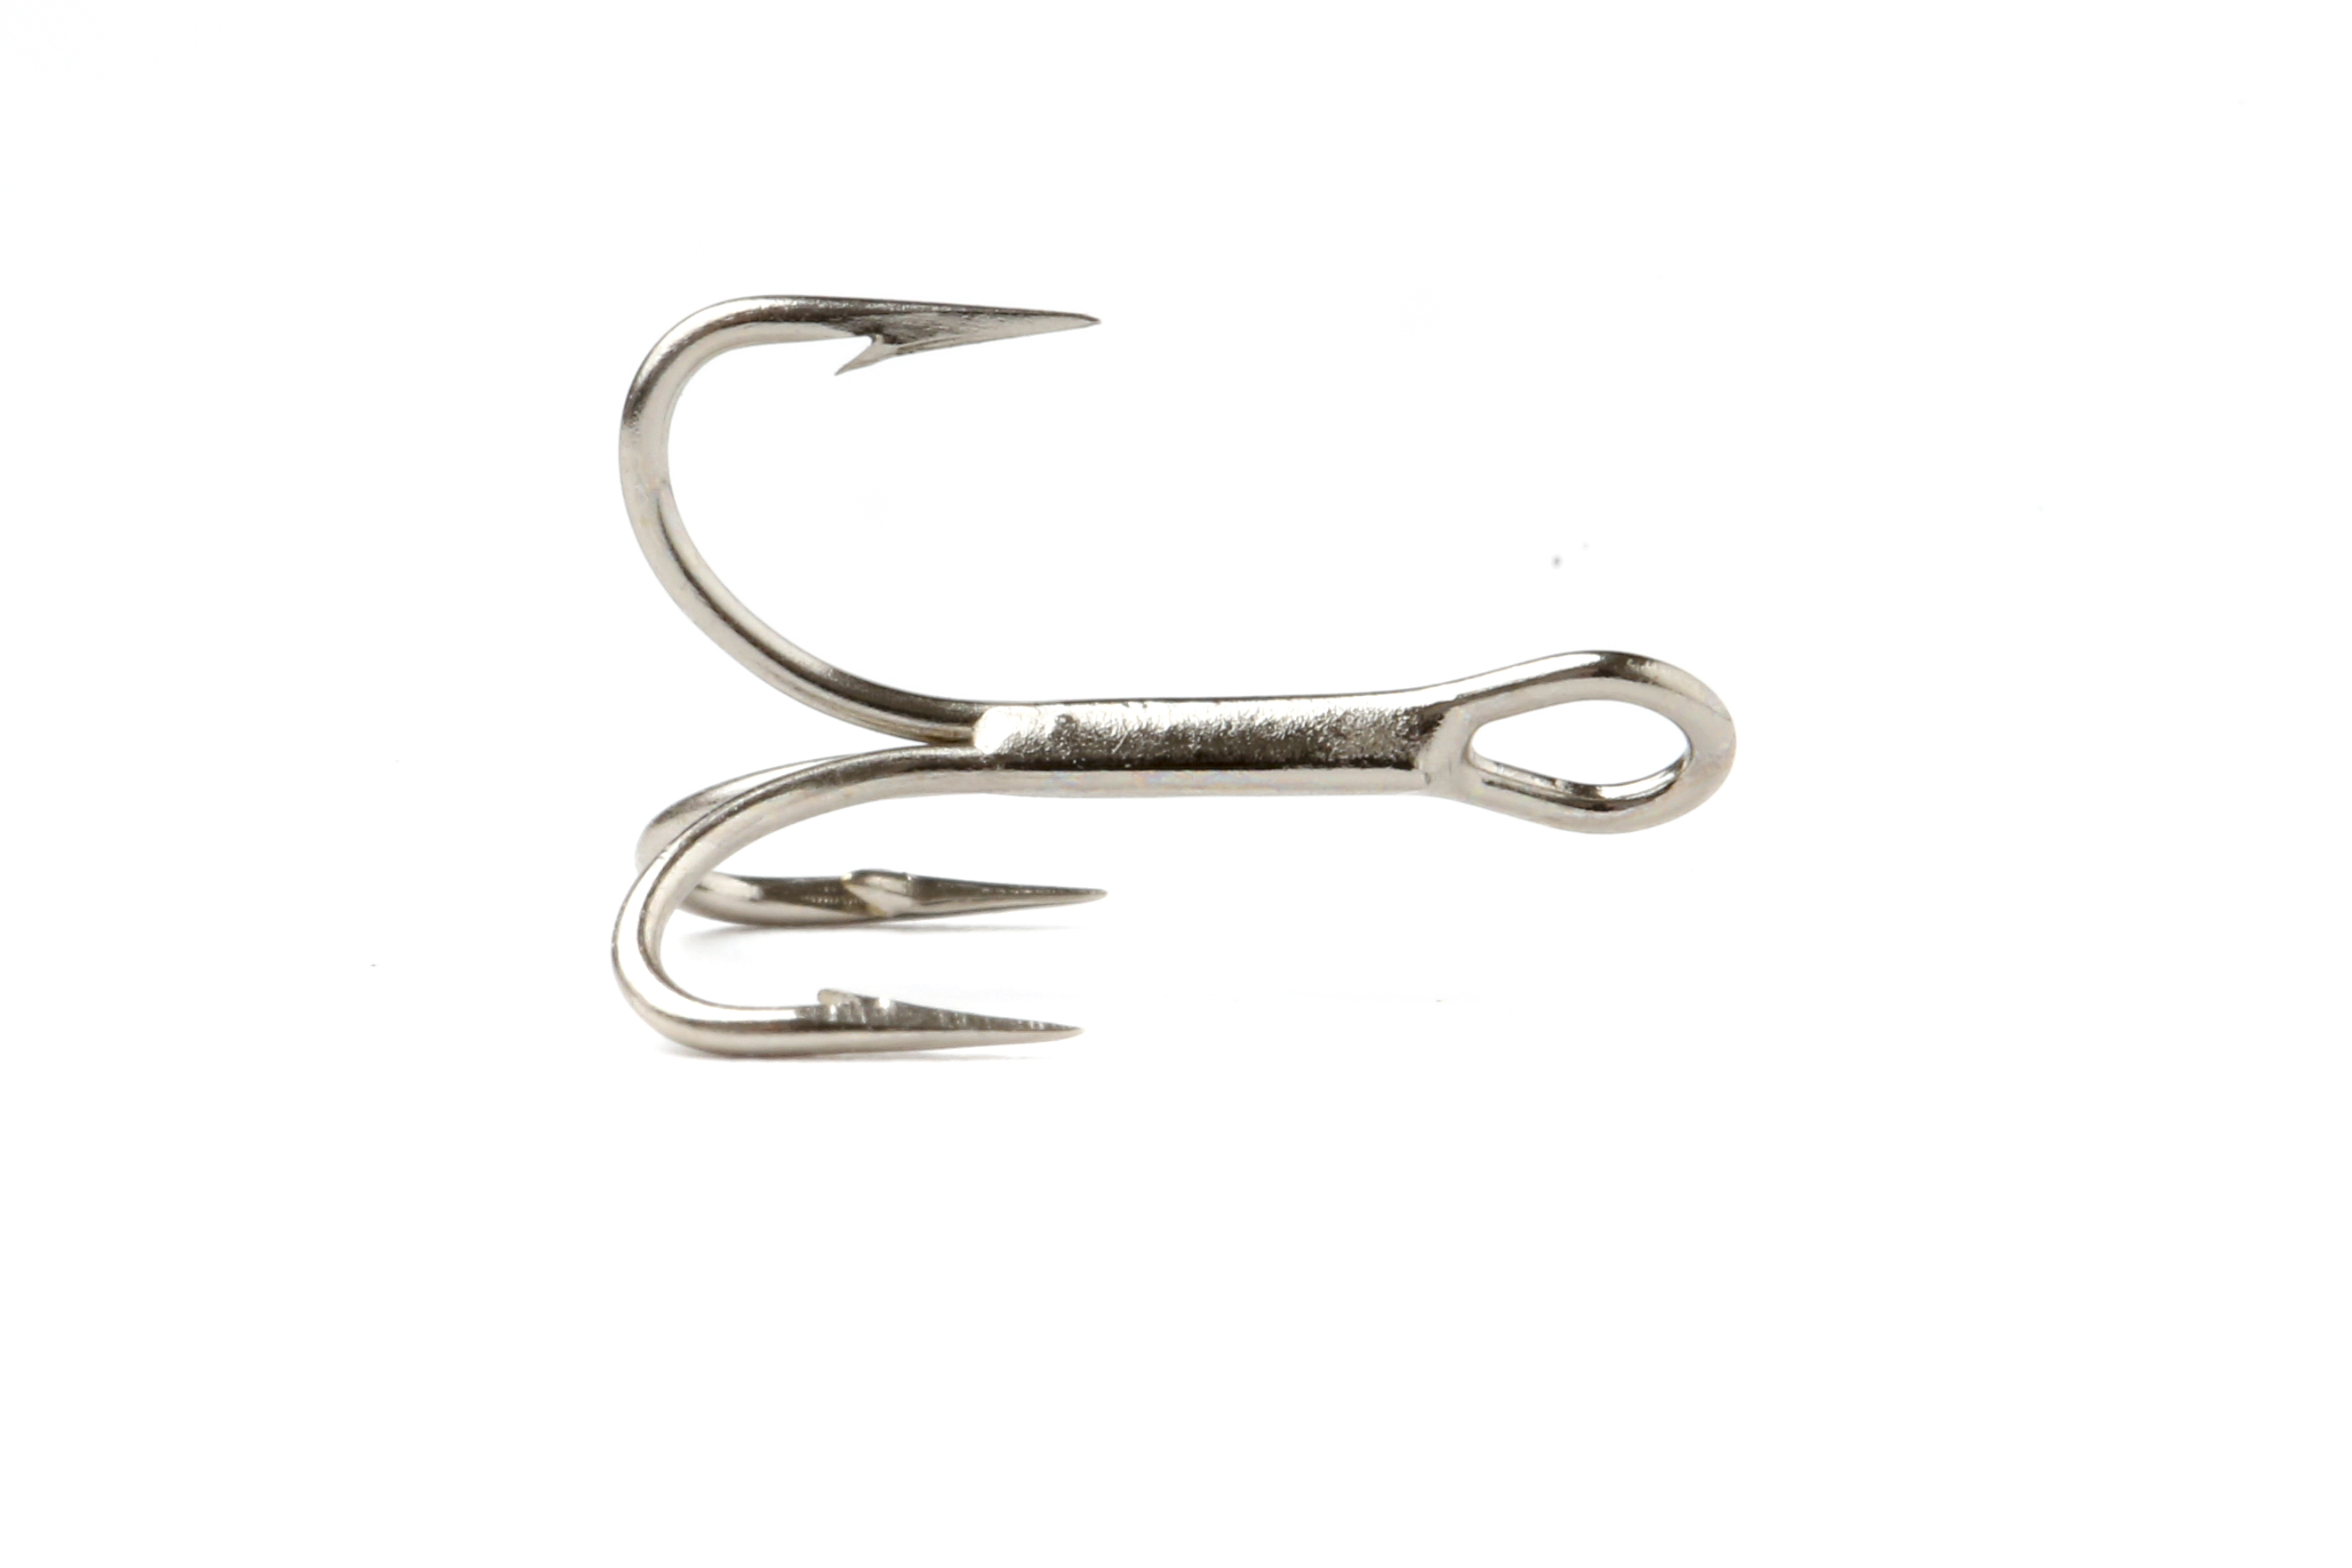 Ten Veniard Waddington Shanks for Sea Trout and Salmon Fly Tying Hooks